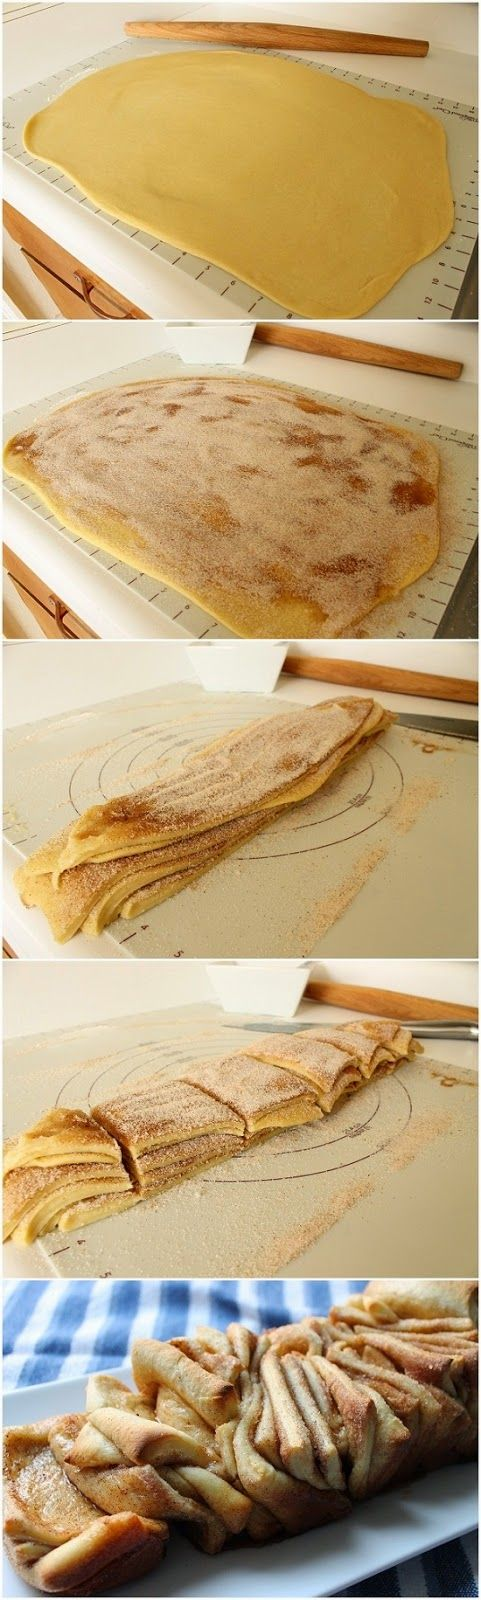 Cinnamon Sugar Pull-Apart Bread, super simple (might add a sweet cream cheese drizzle on top:)